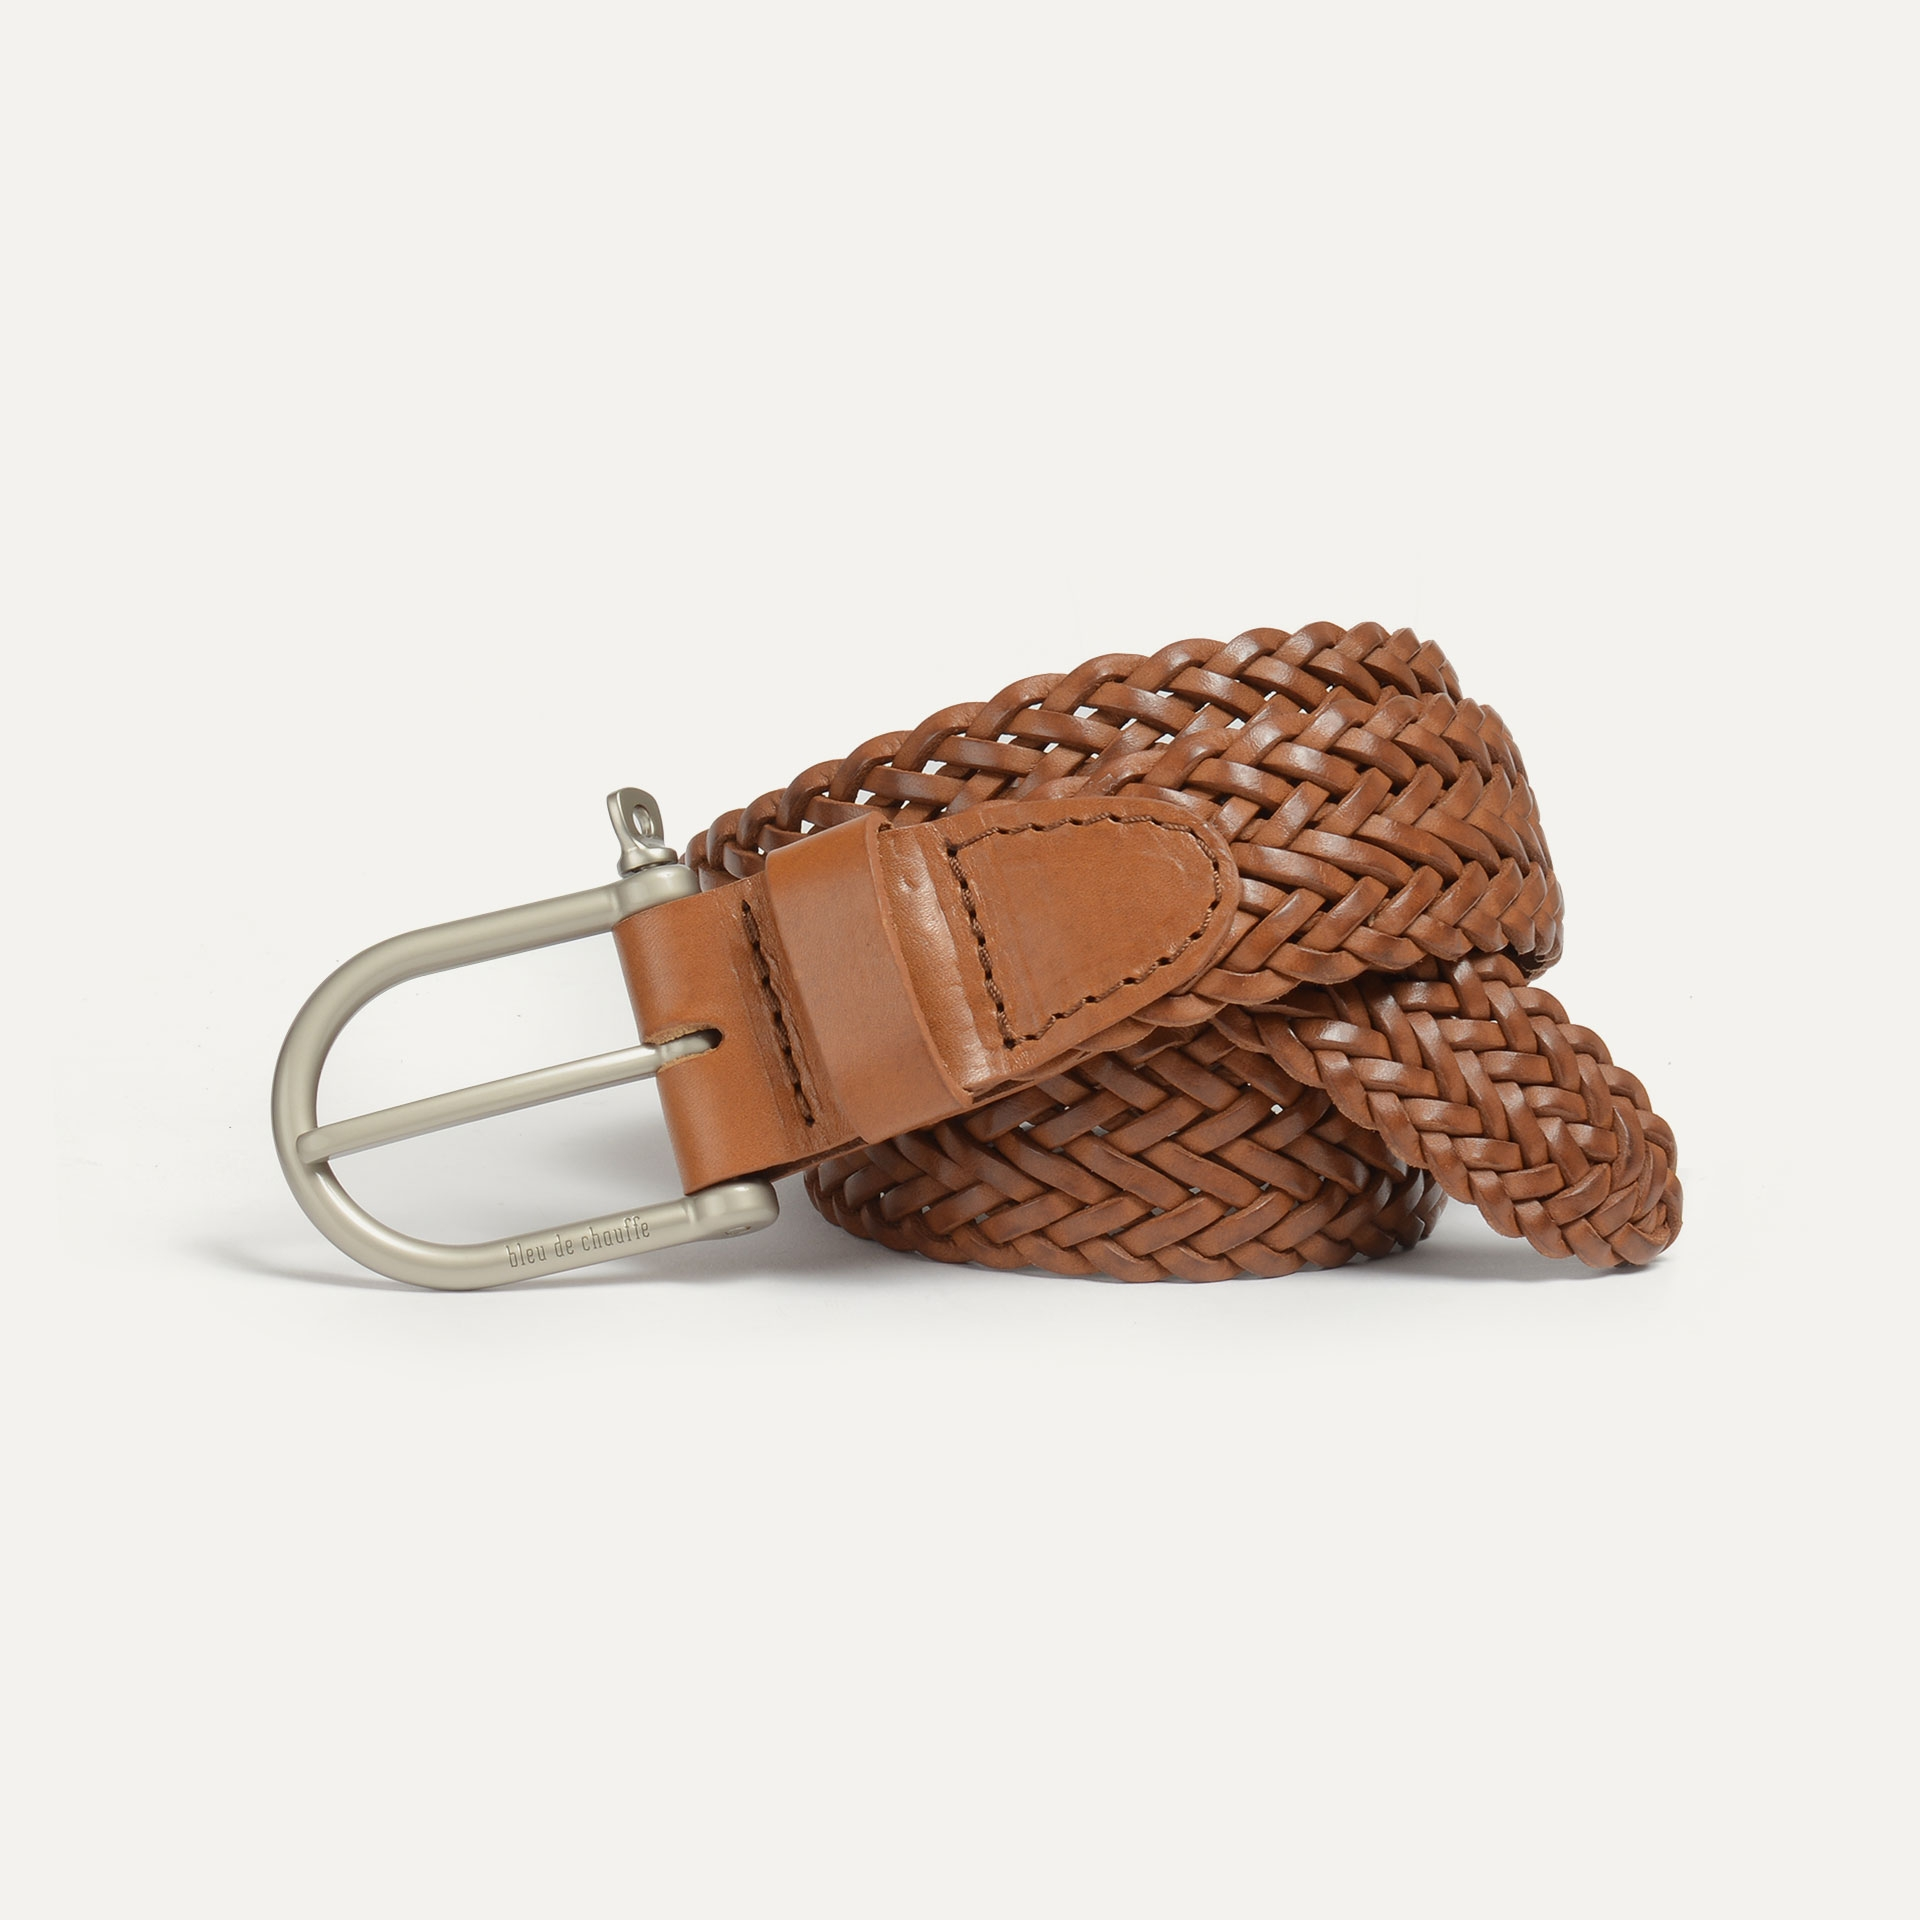 Manille Belt / braided leather - Pain brûlé (image n°1)